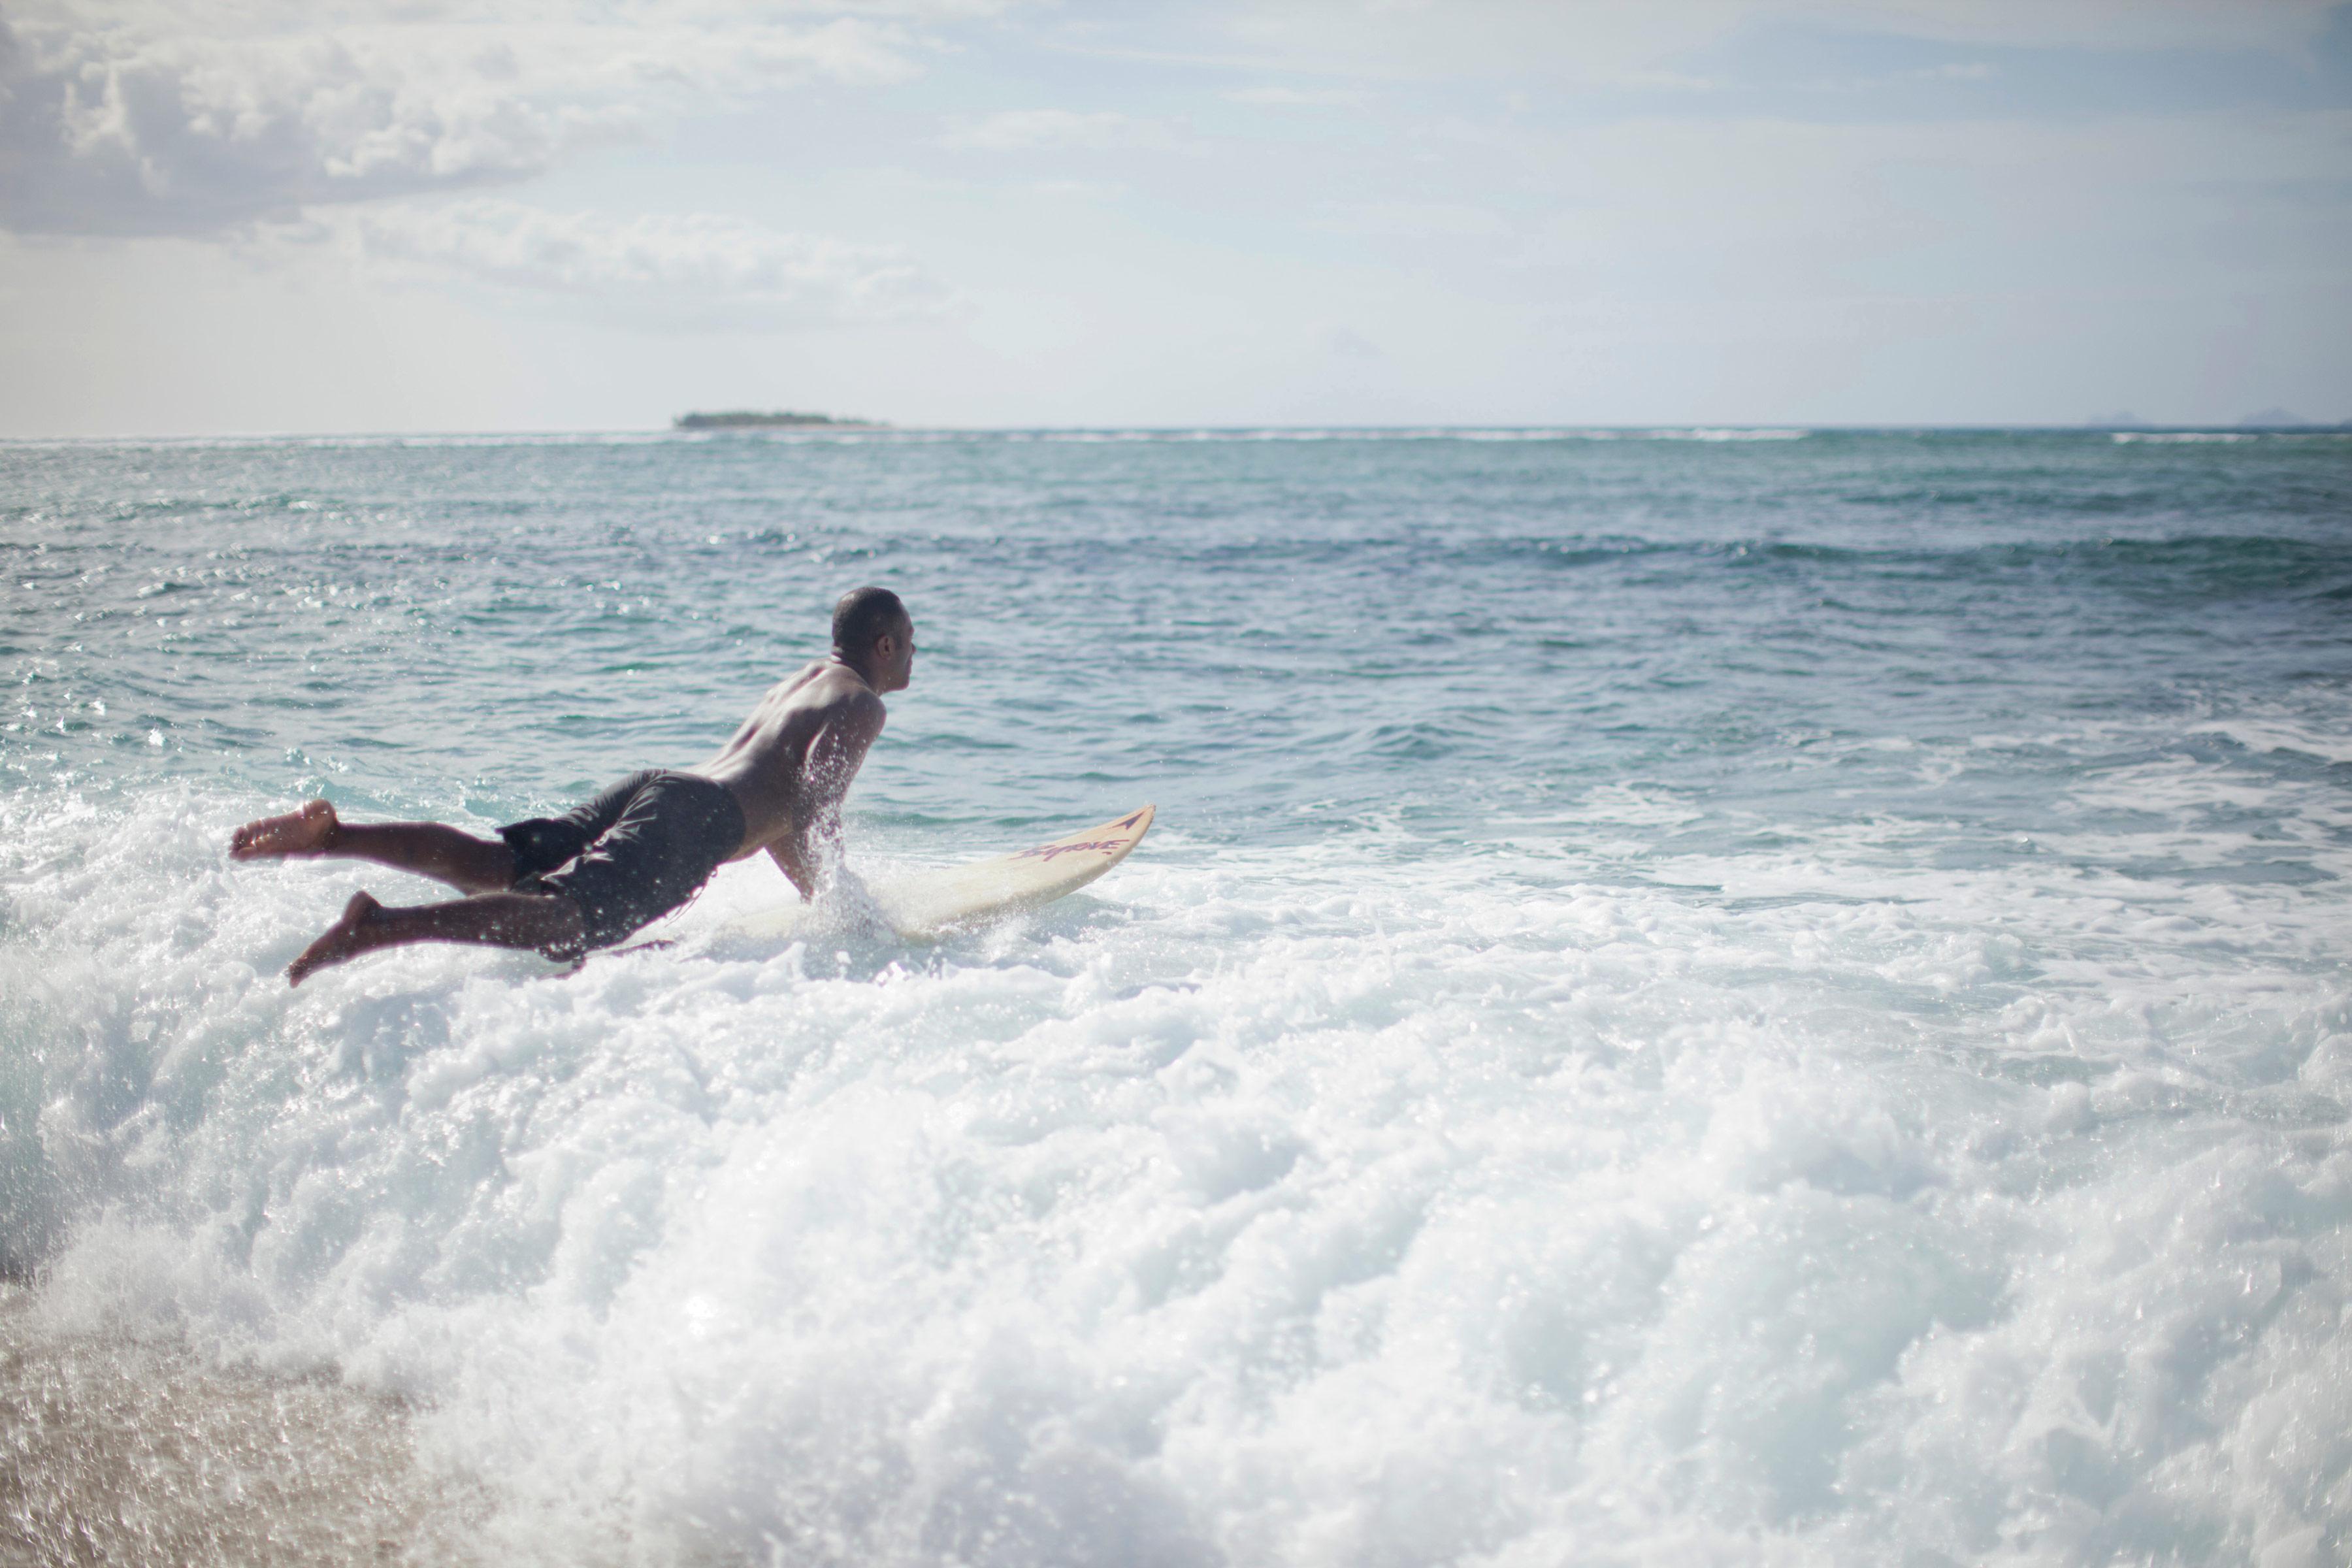 Flint Sydney Jonathan May Director & Photographer